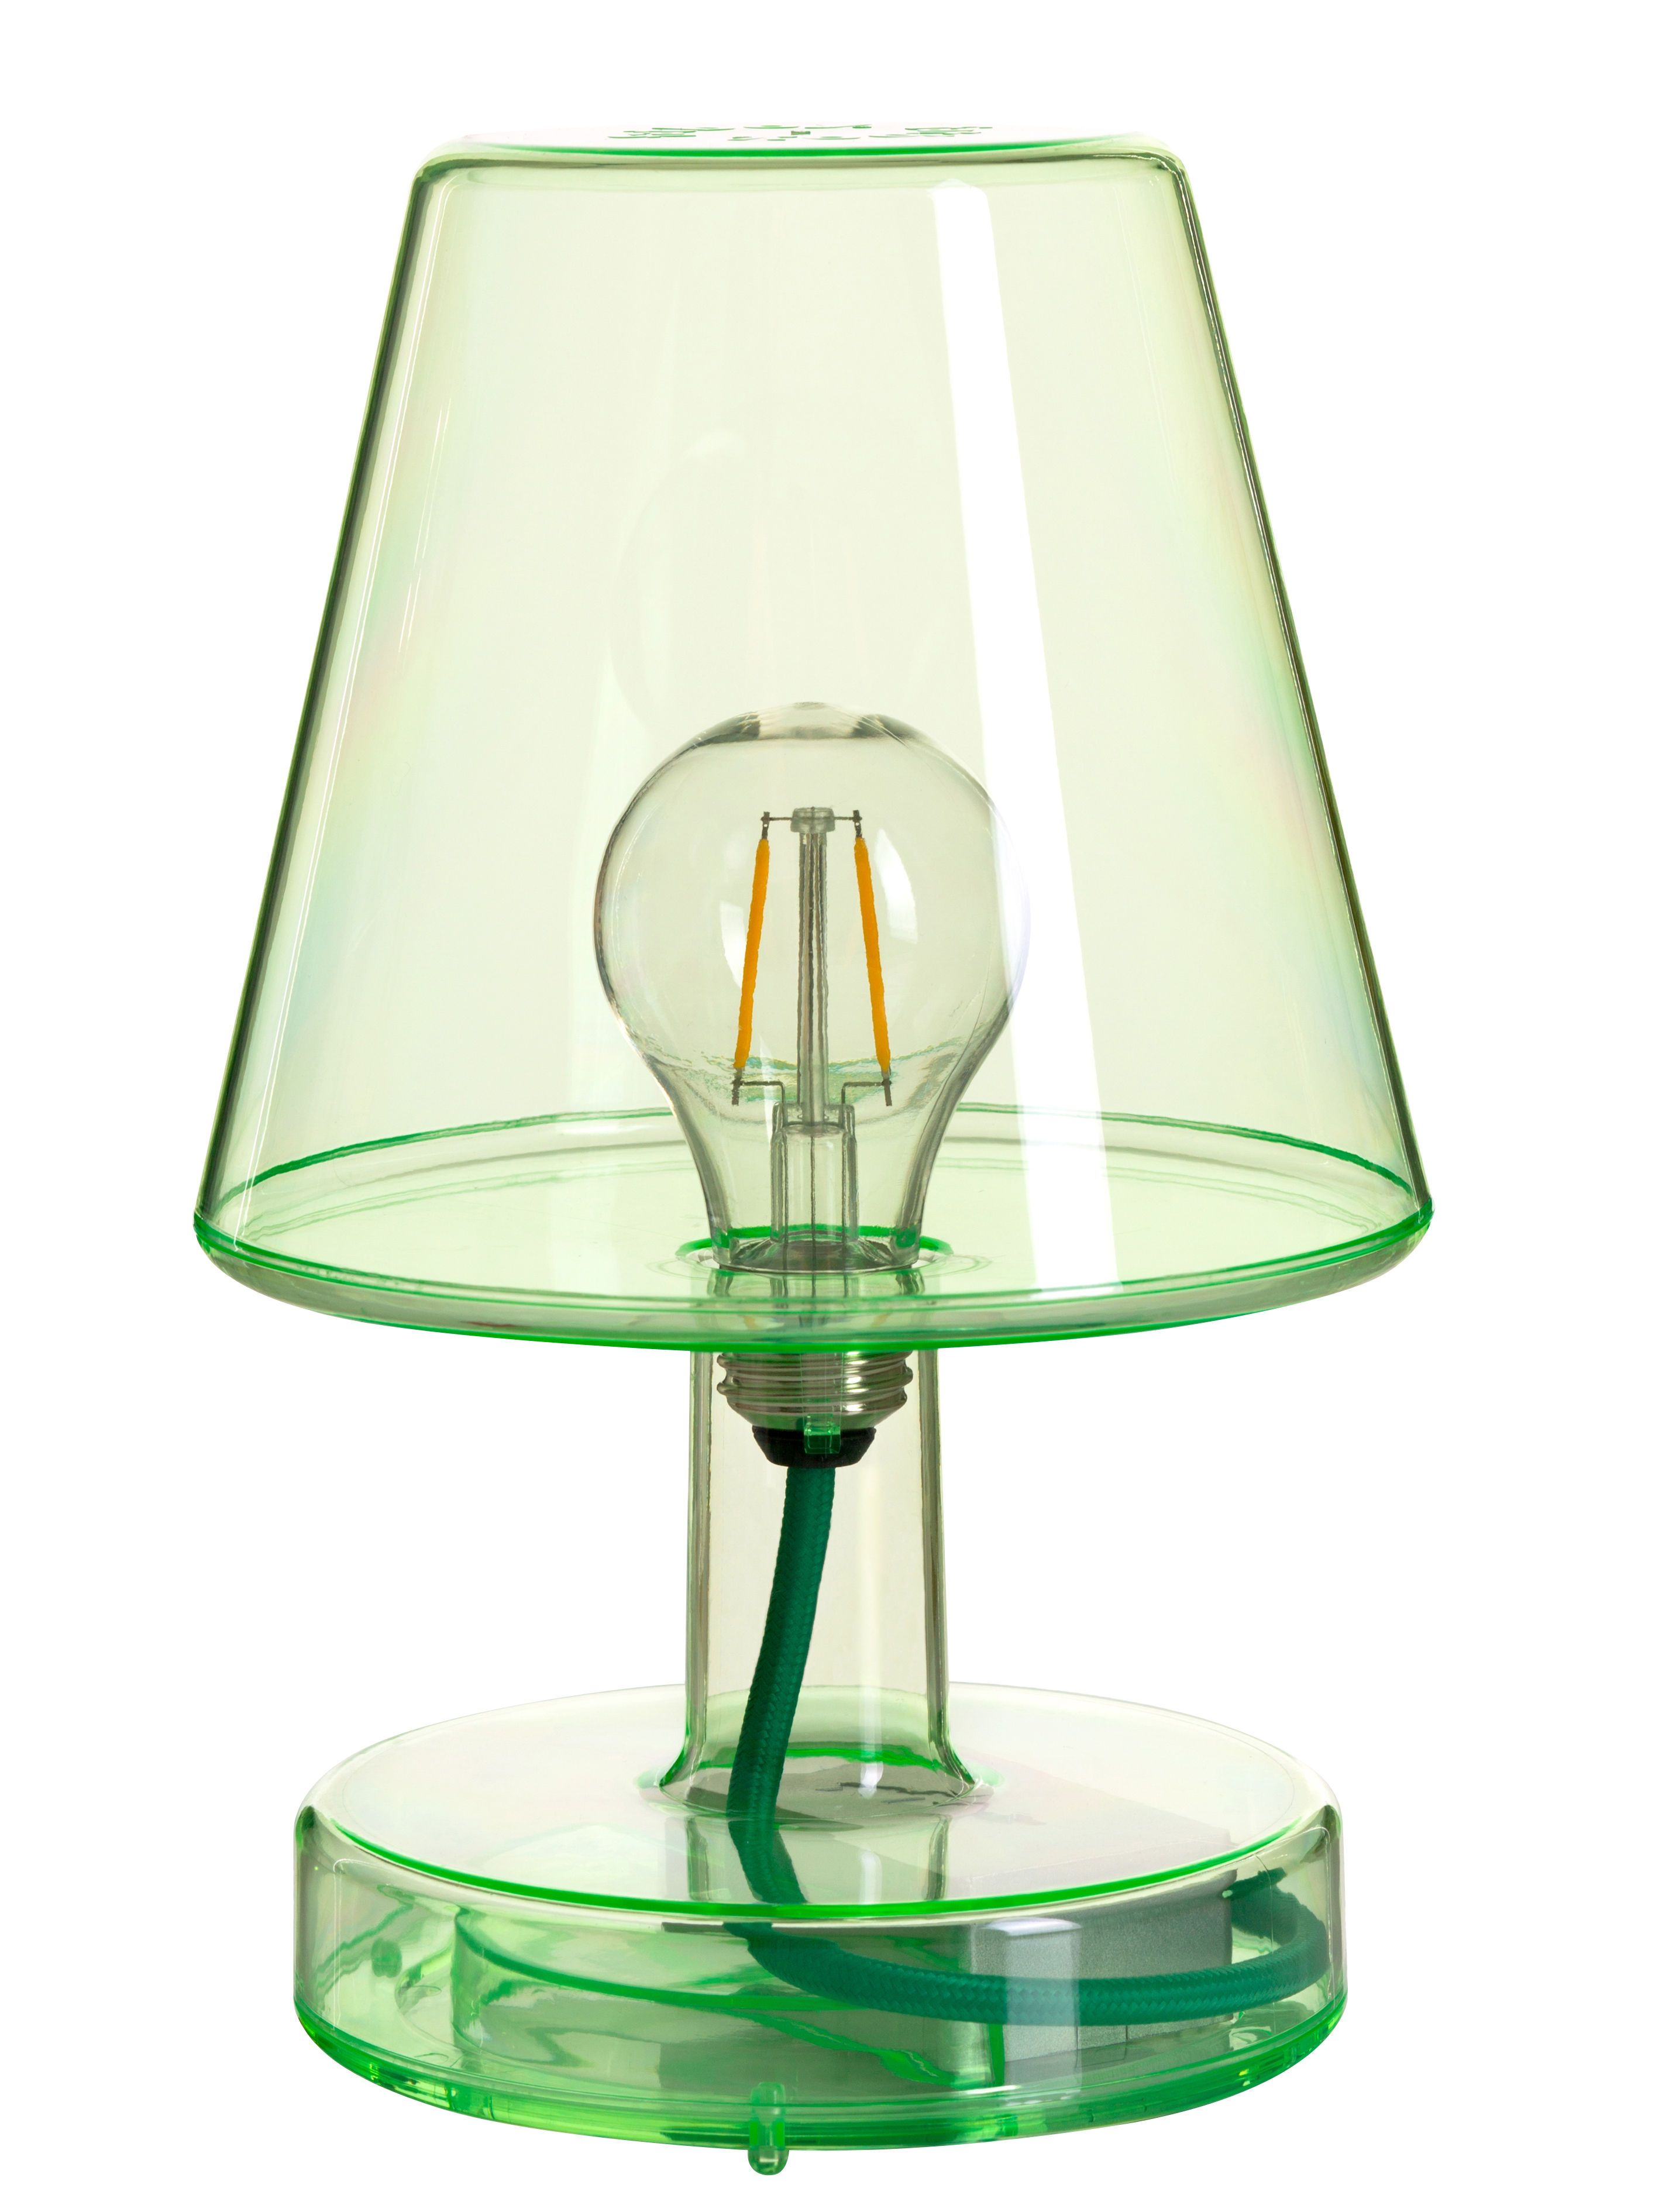 transloetje led kabellos fatboy lampe ohne kabel